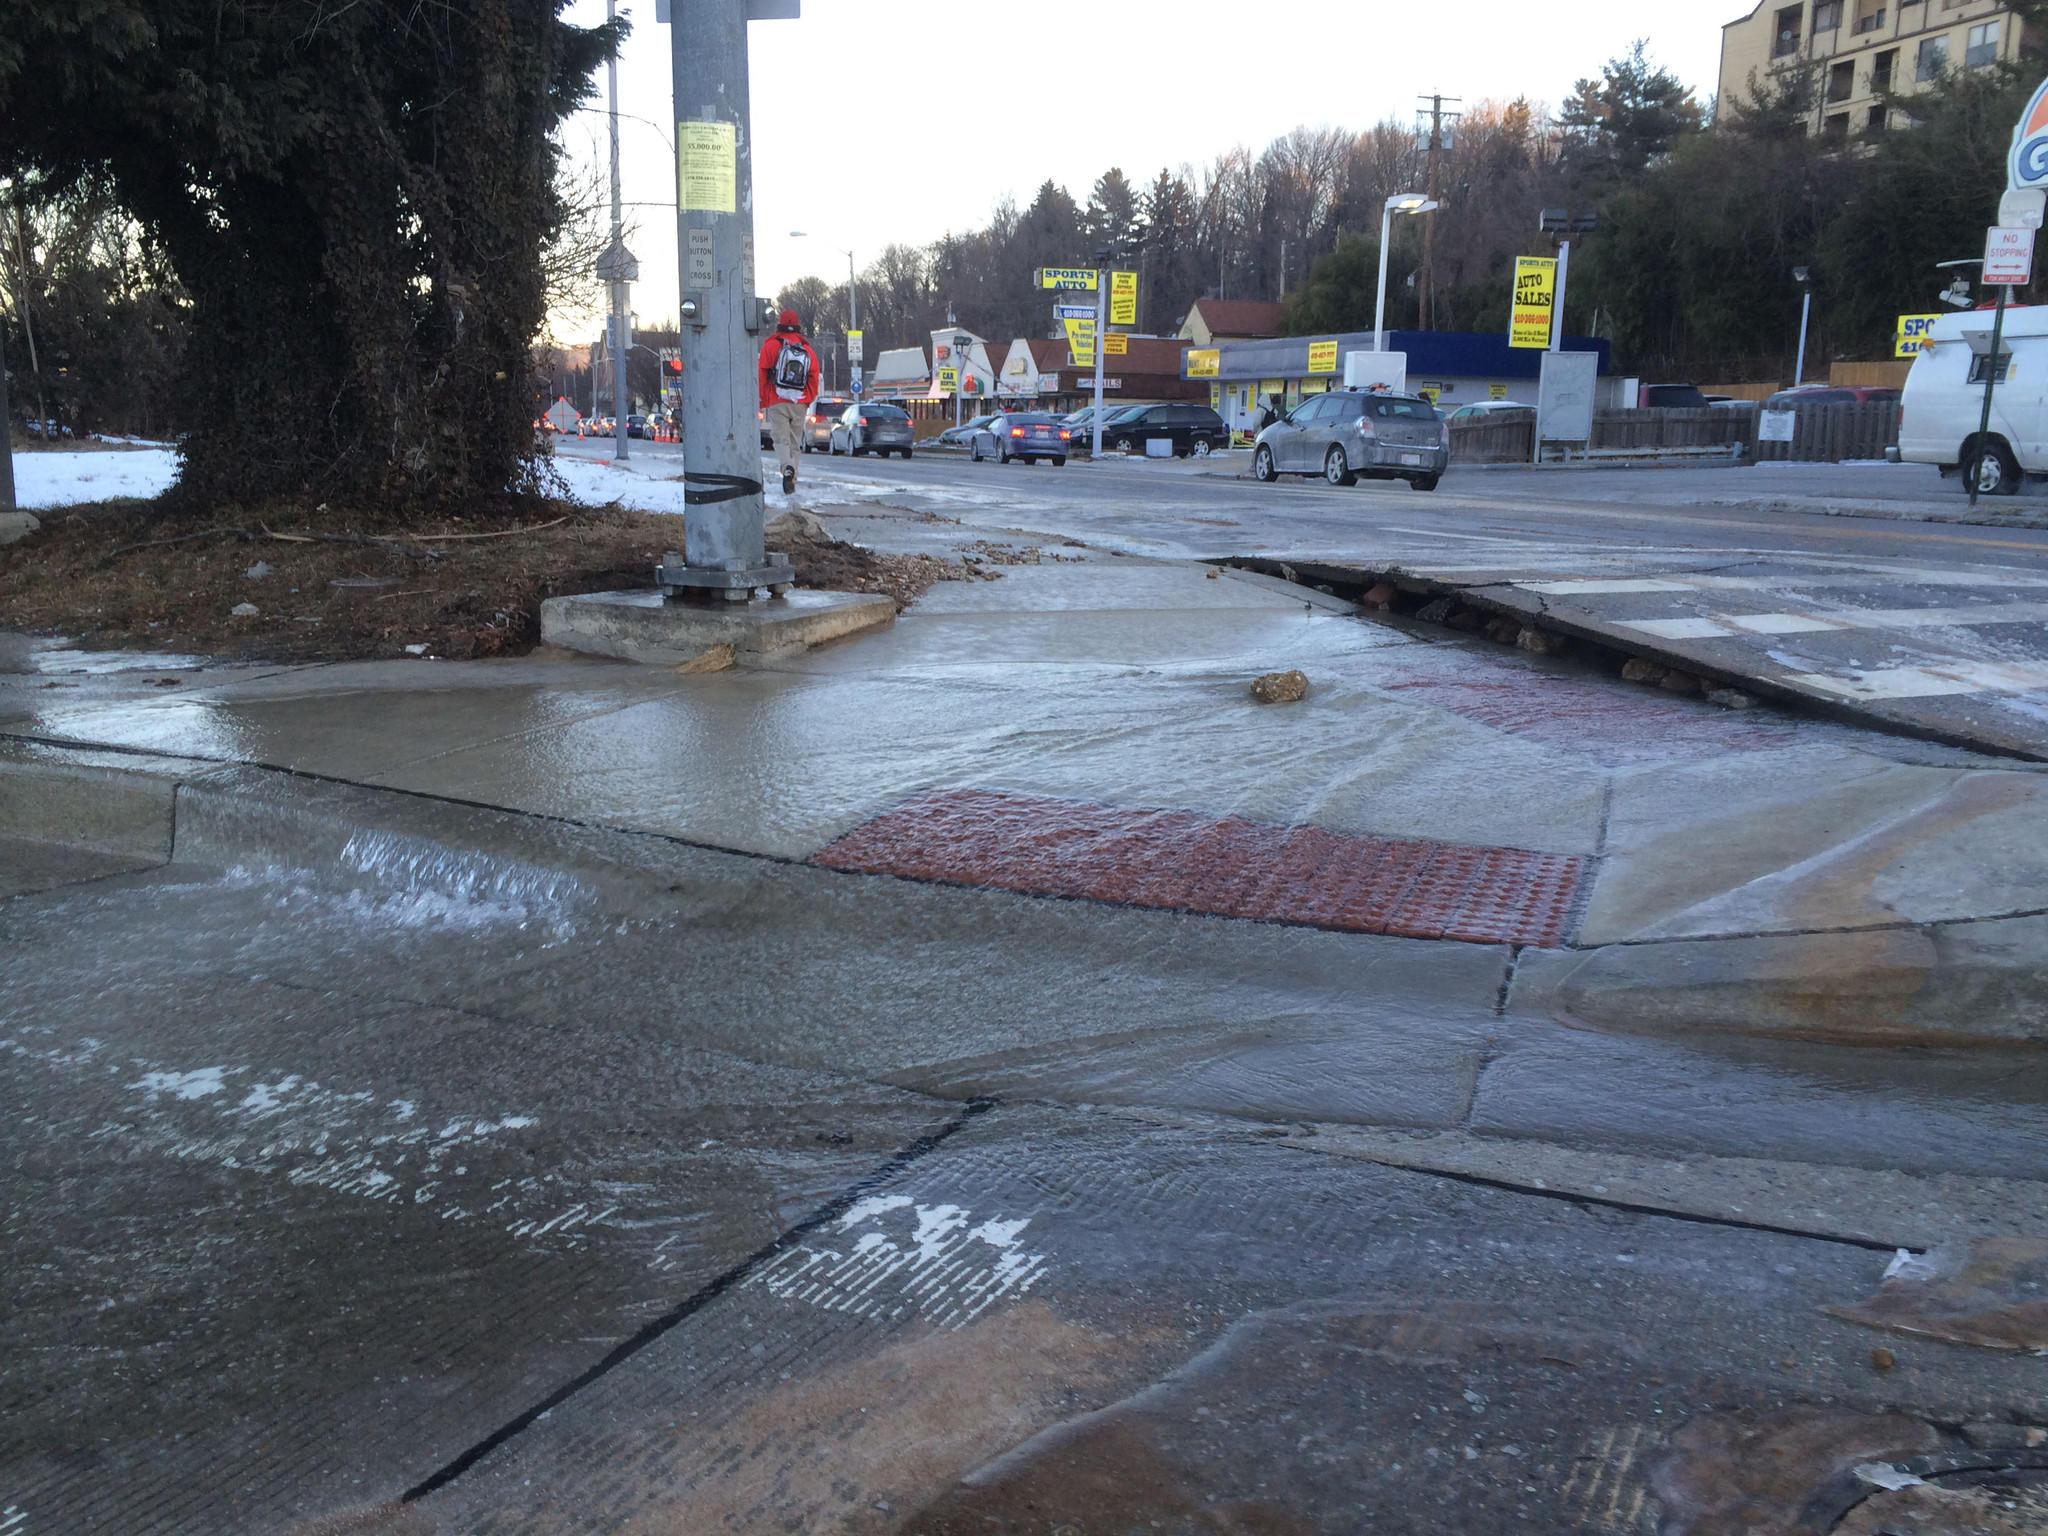 Water main break at Falls Road and Cold Spring Lane Jan. 30, 2014